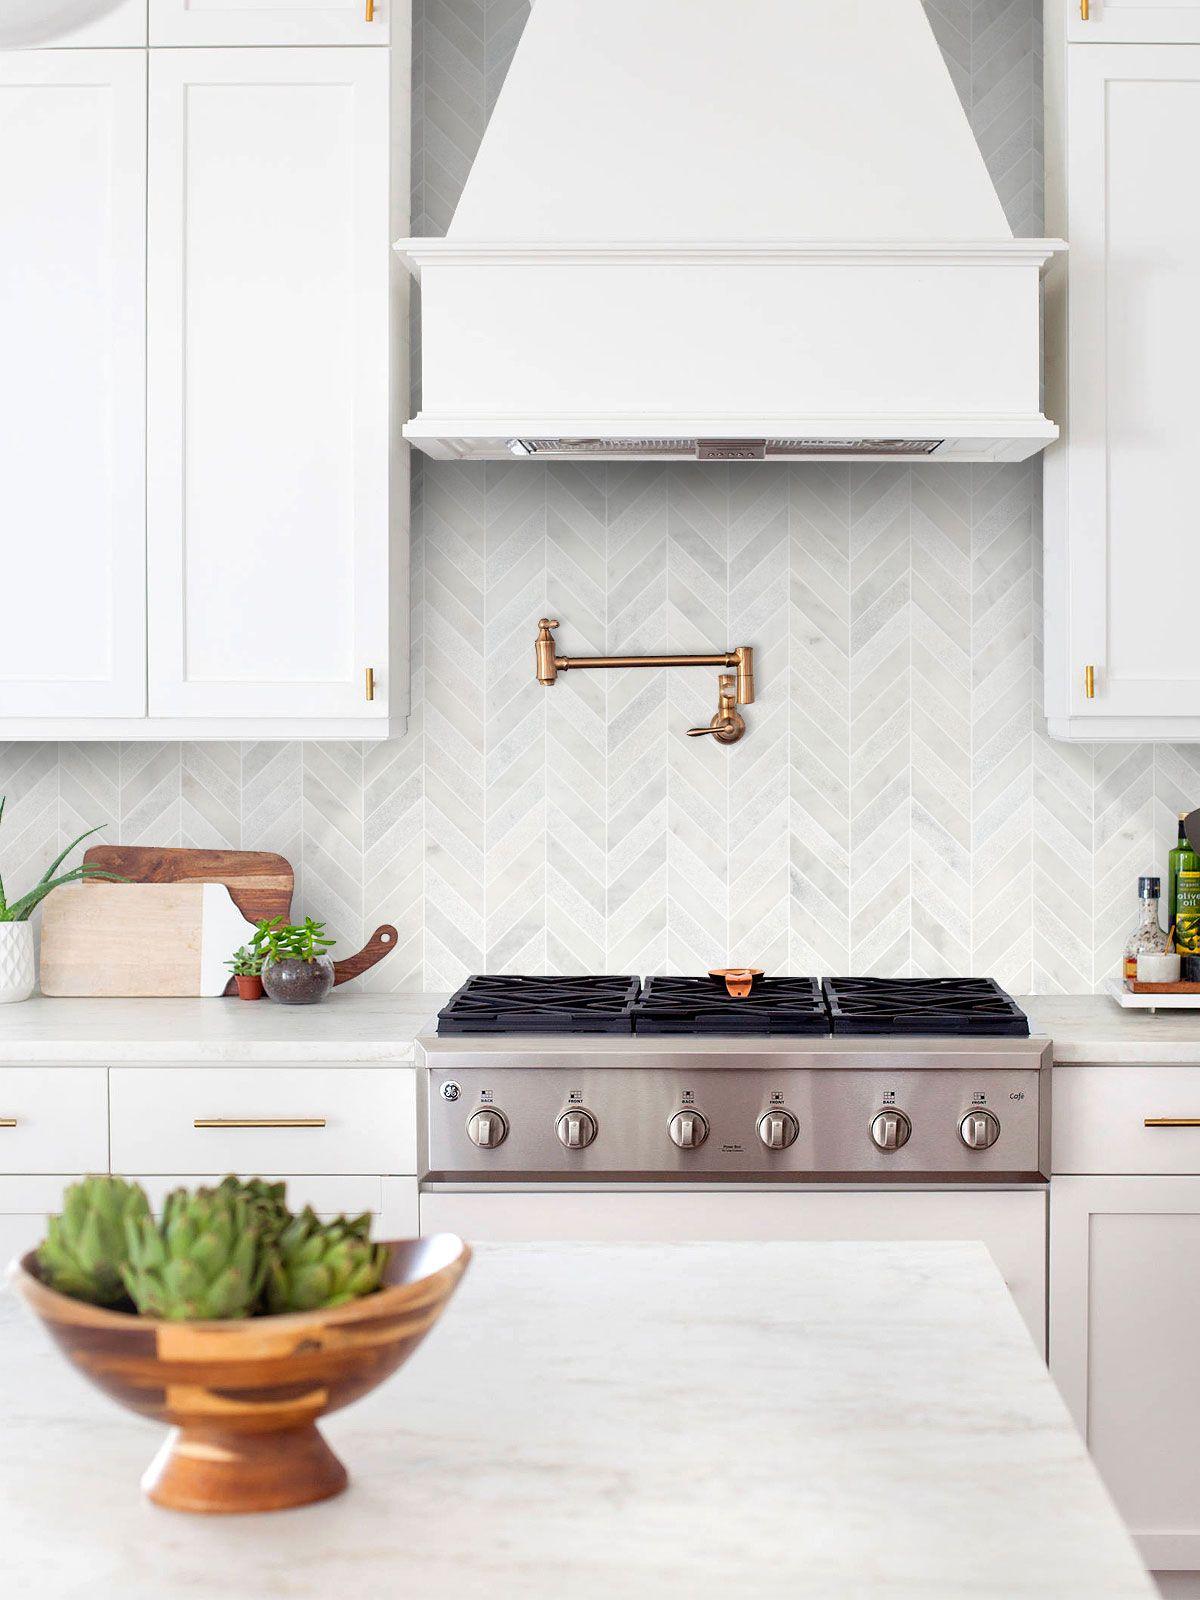 White Modern Marble Chevron Backsplash Tile Backsplash Com Kitchen Cottage Kitchen Design Kitchen Remodel